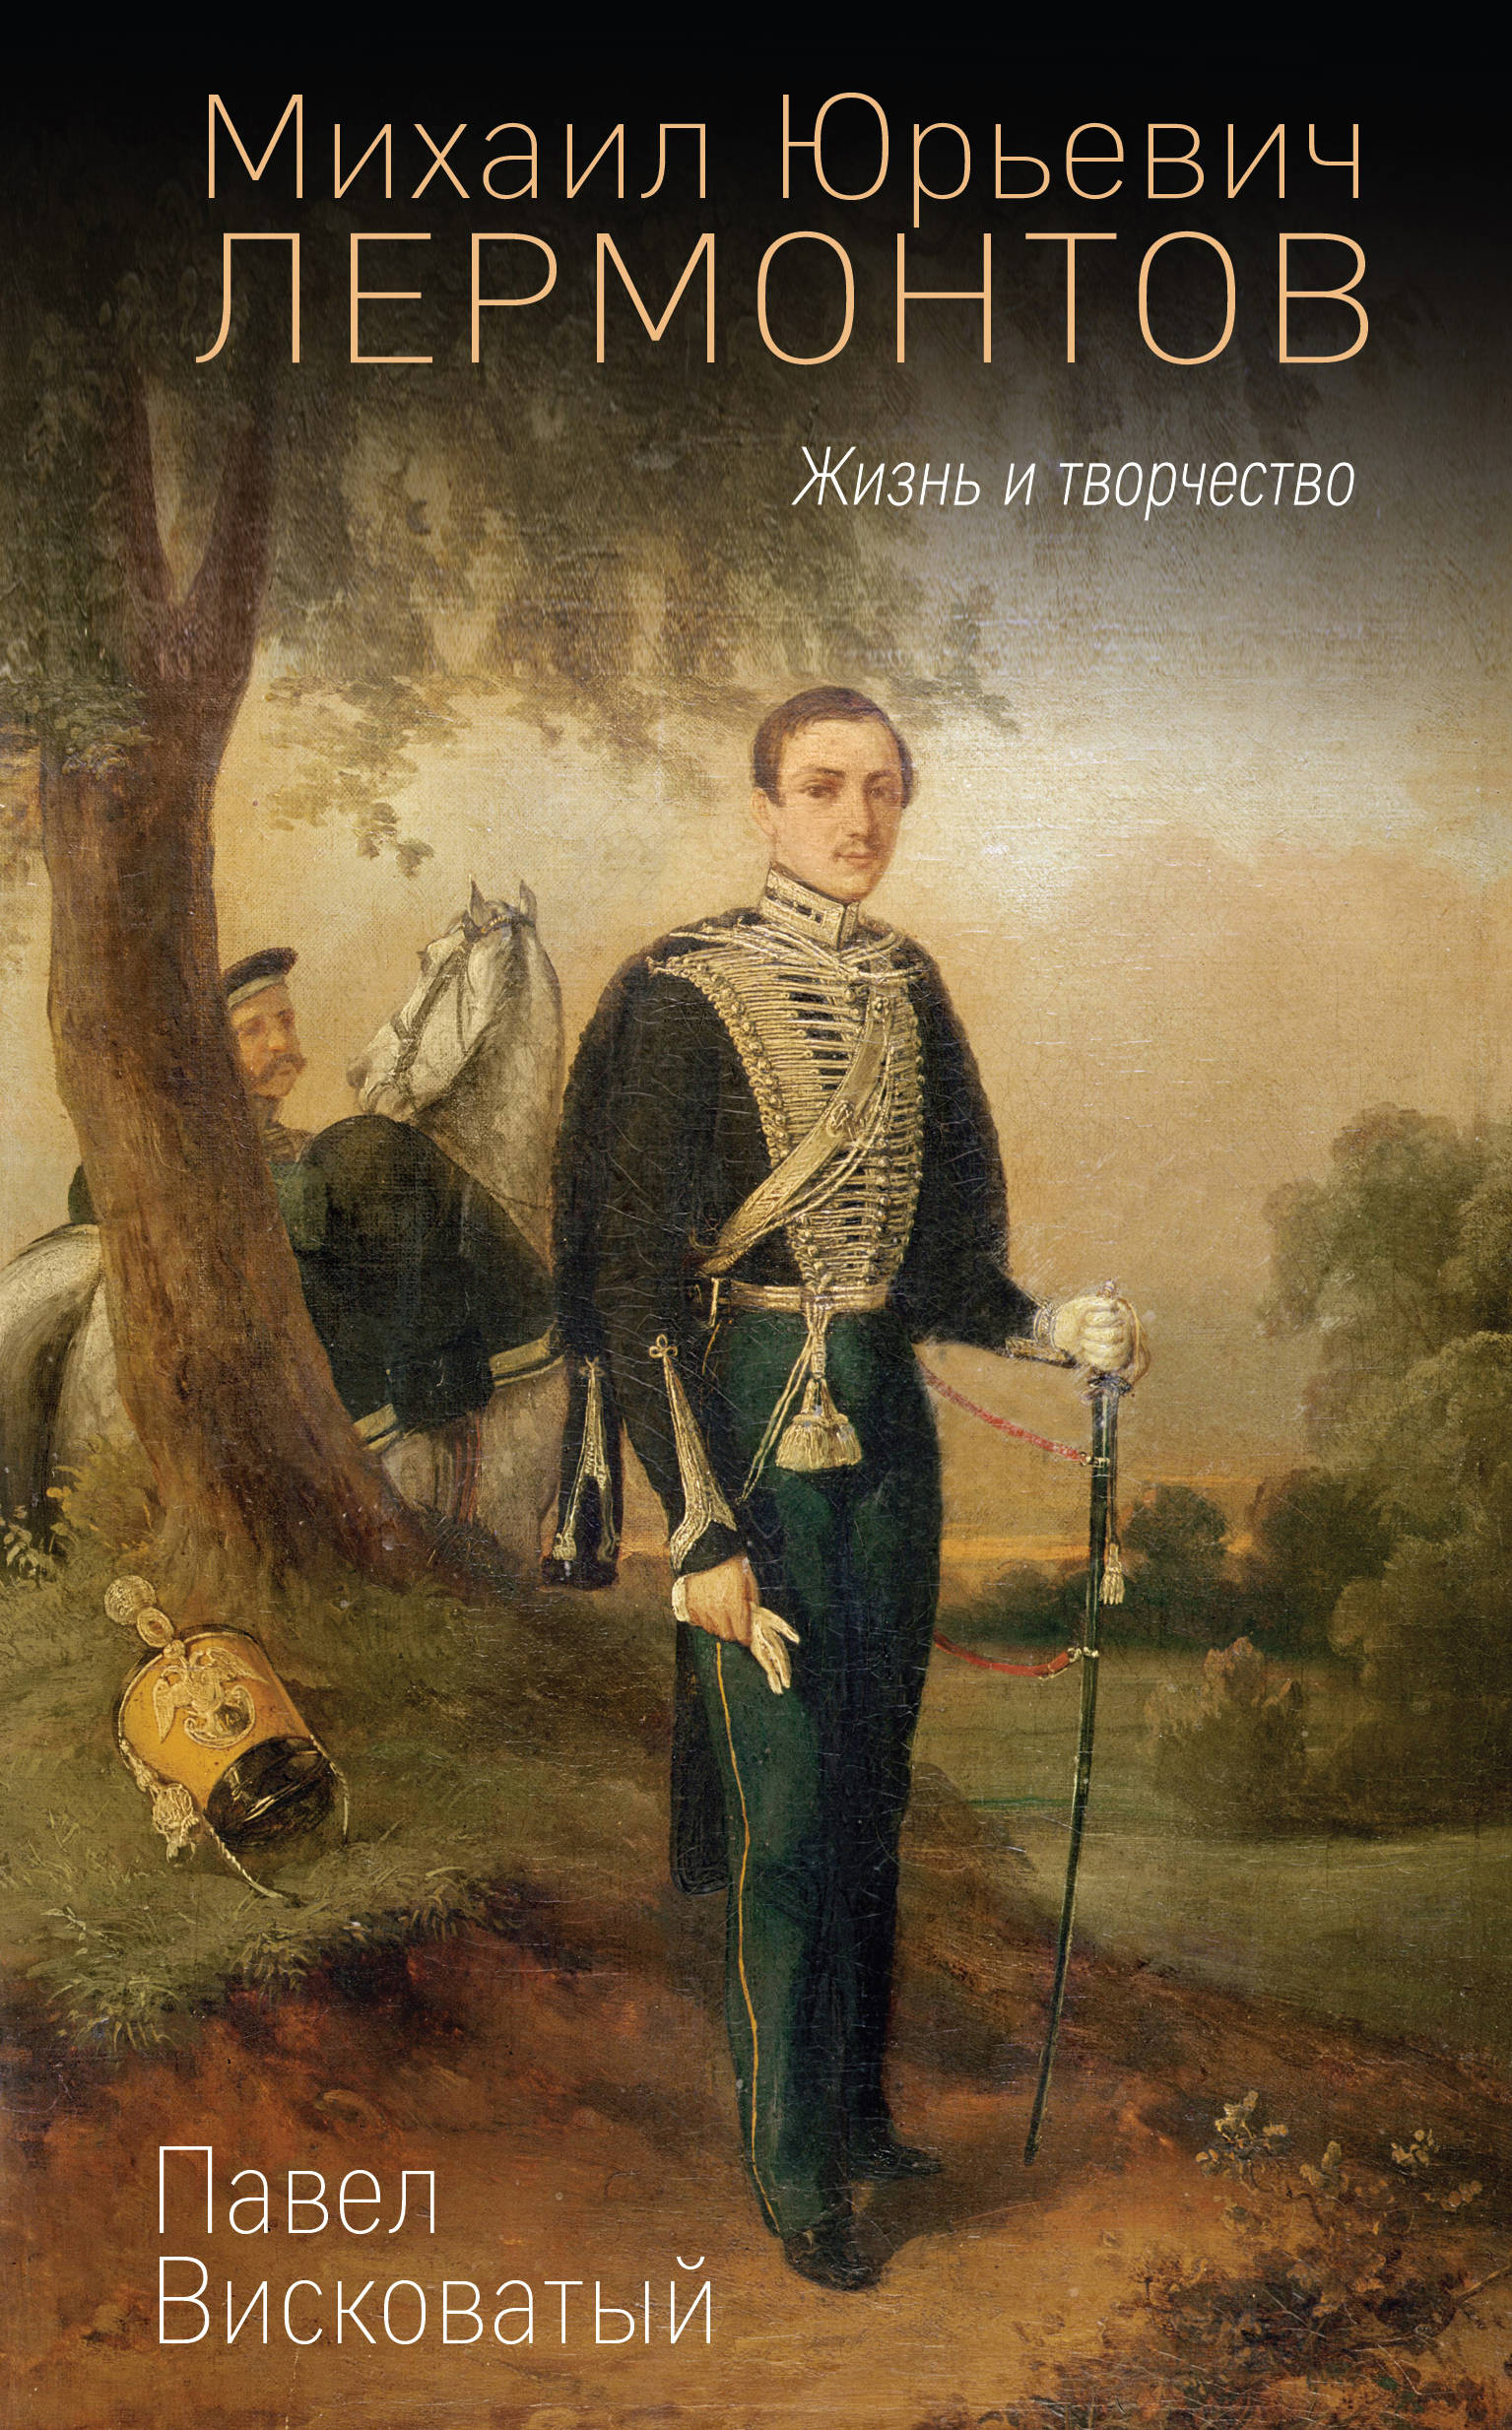 Mikhail Jurevich Lermontov. Zhizn i tvorchestvo